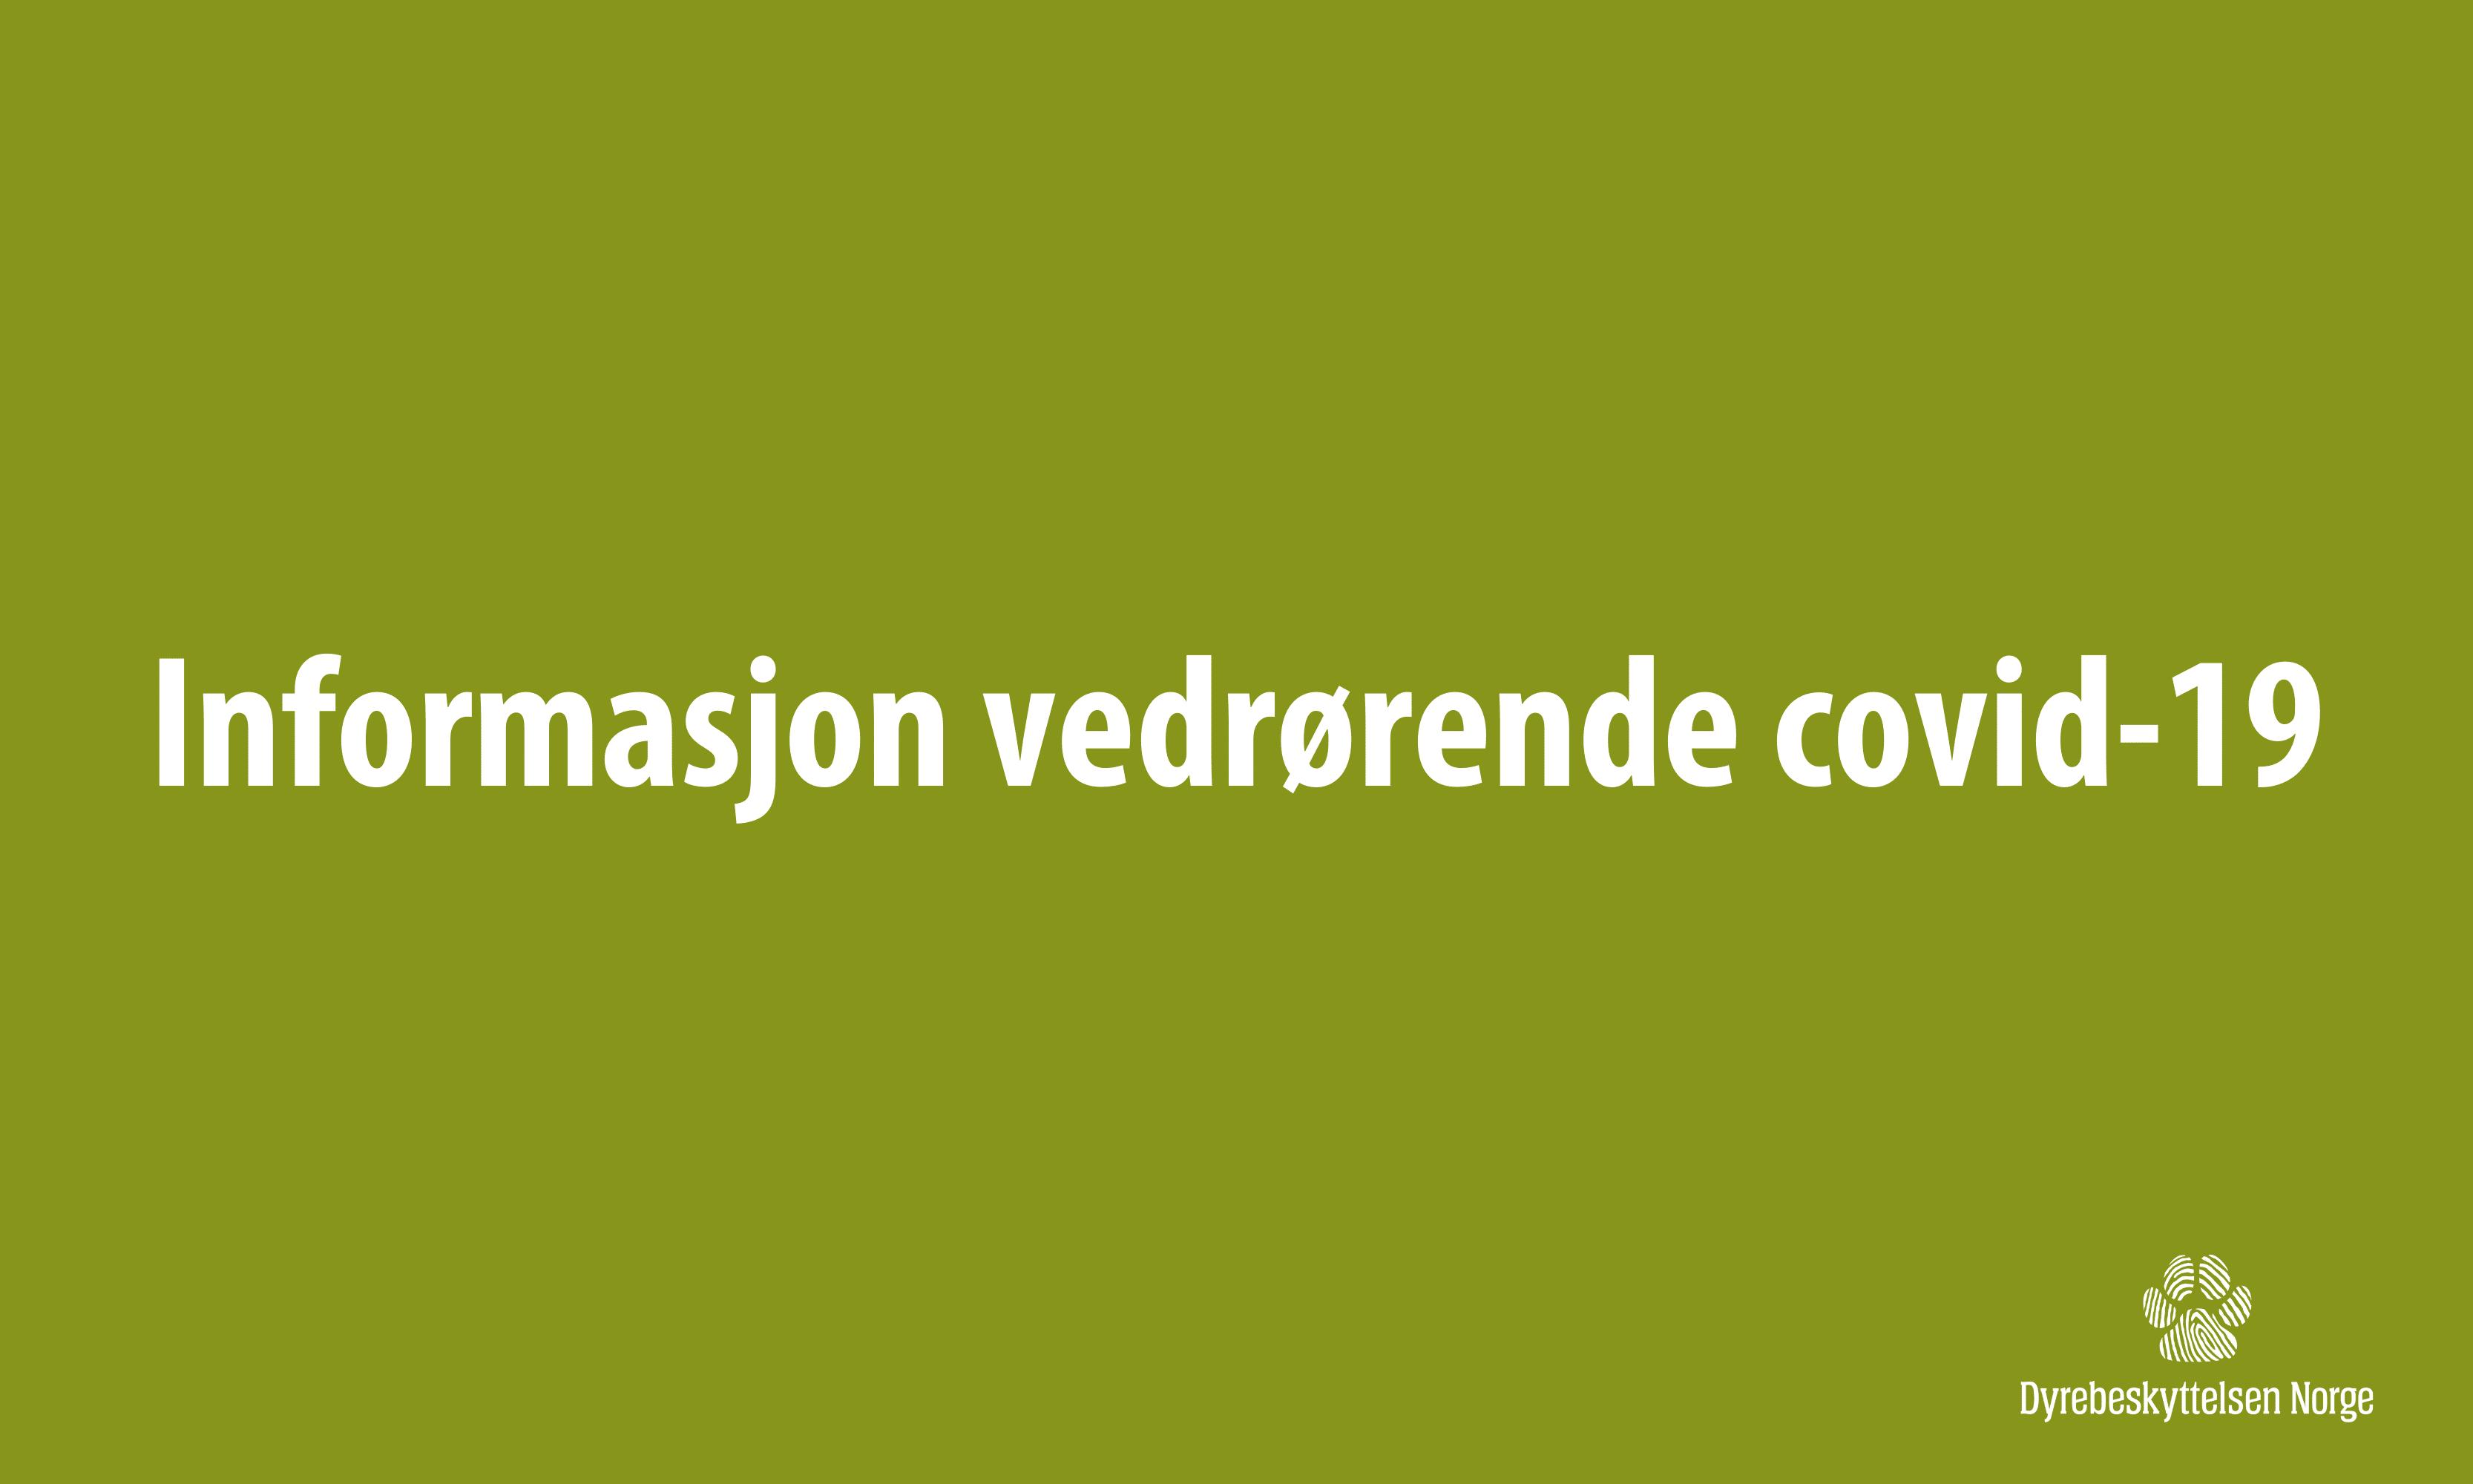 Informasjon vedrørende covid-19